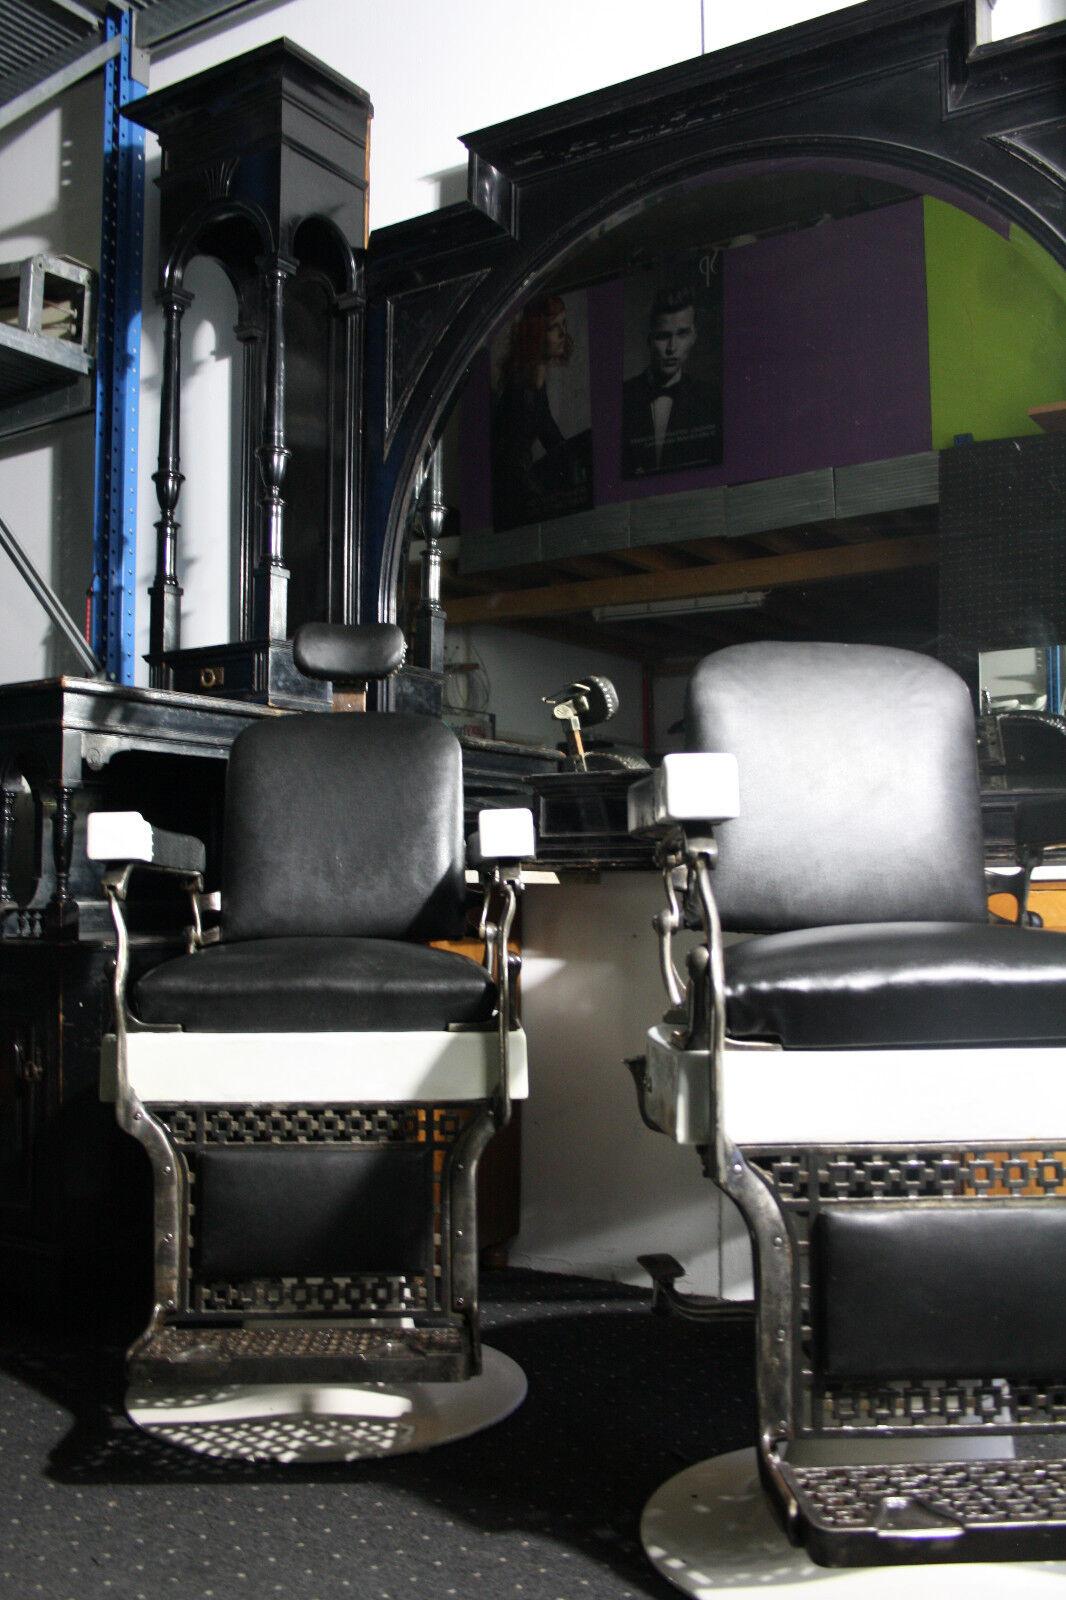 belmont barber chair parts canada kitchen cushions walmart friseur einrichtung koken antik shop jugendstil